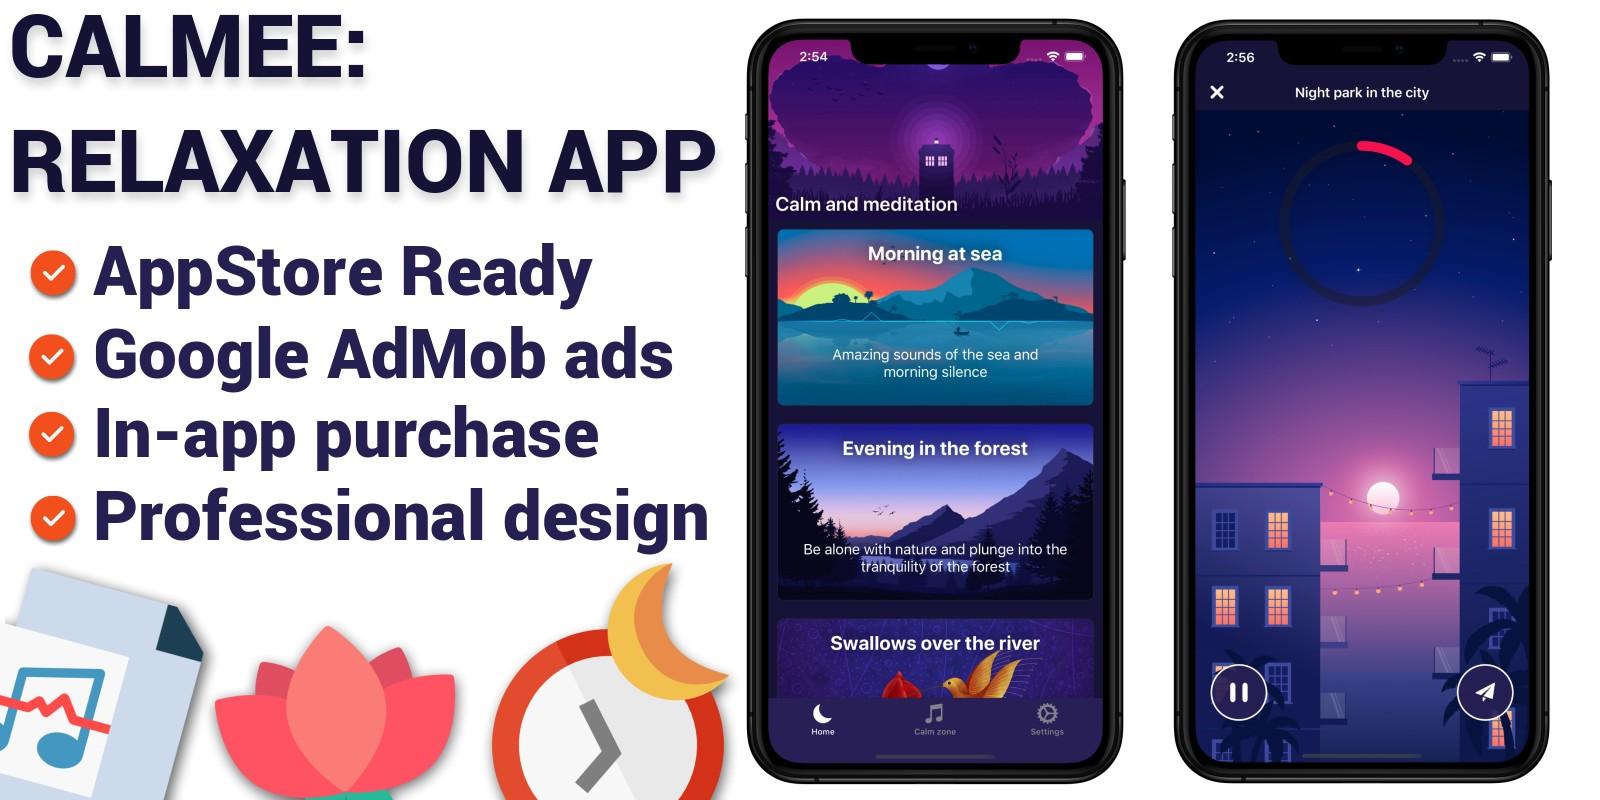 Calmee - Relaxation iOS Application